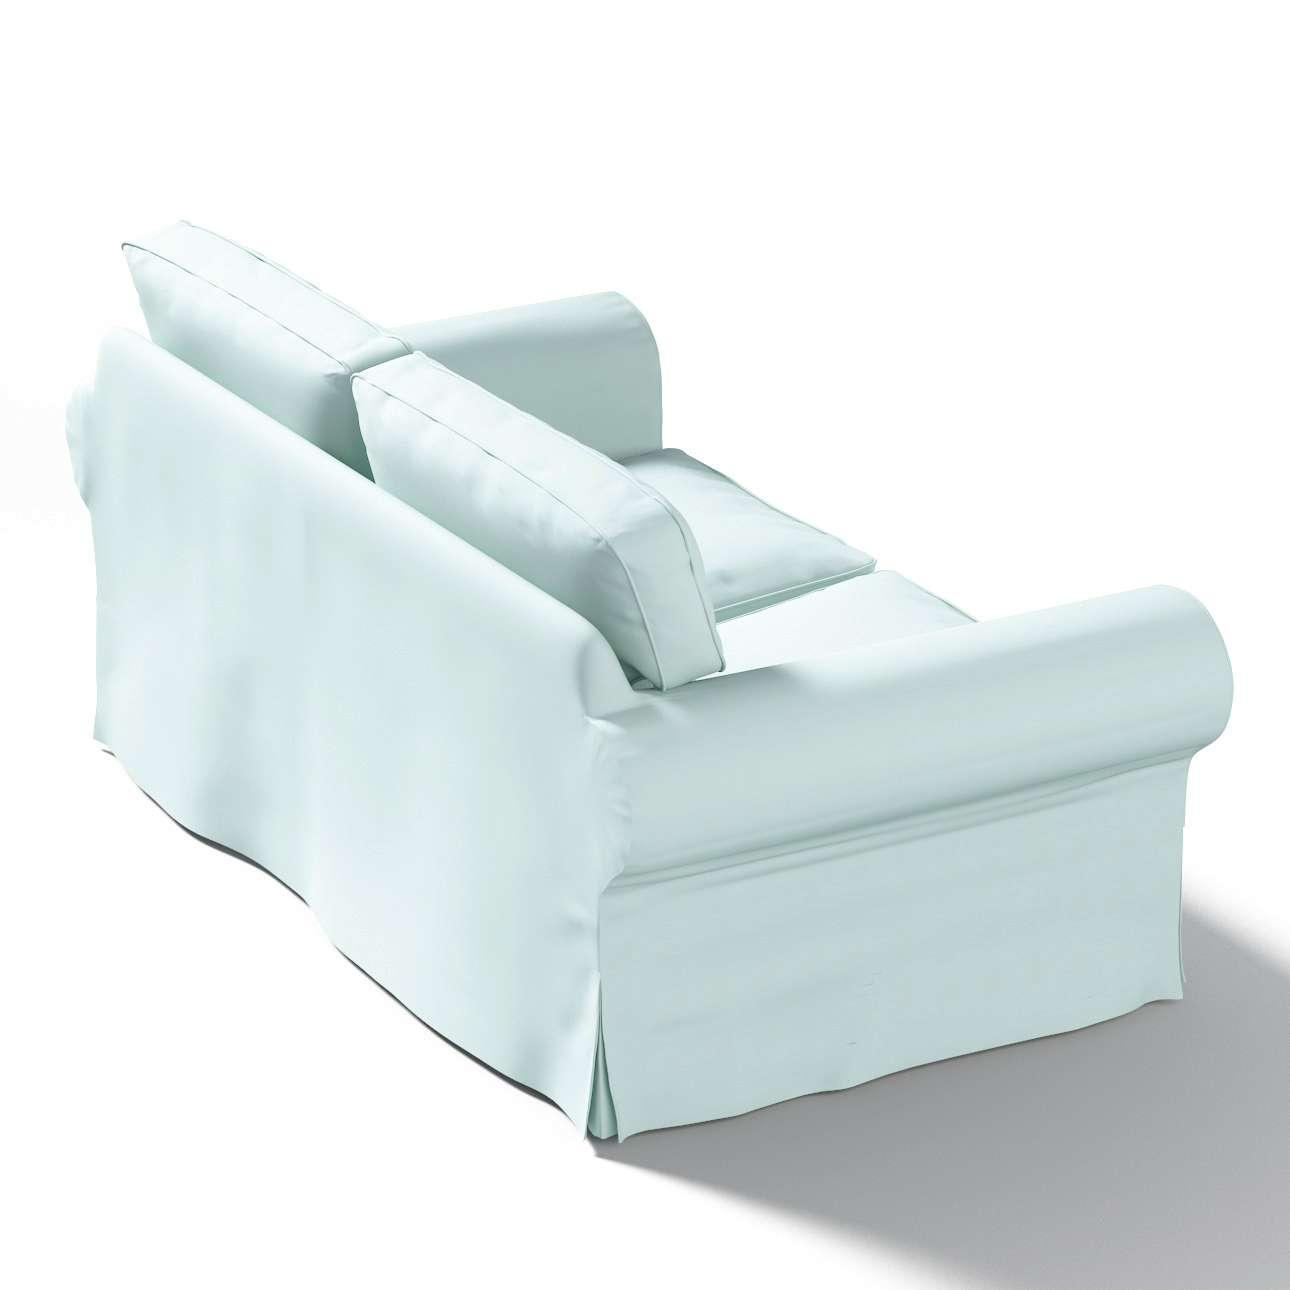 Ektorp 2-Sitzer Sofabezug nicht ausklappbar Sofabezug für  Ektorp 2-Sitzer nicht ausklappbar von der Kollektion Cotton Panama, Stoff: 702-10